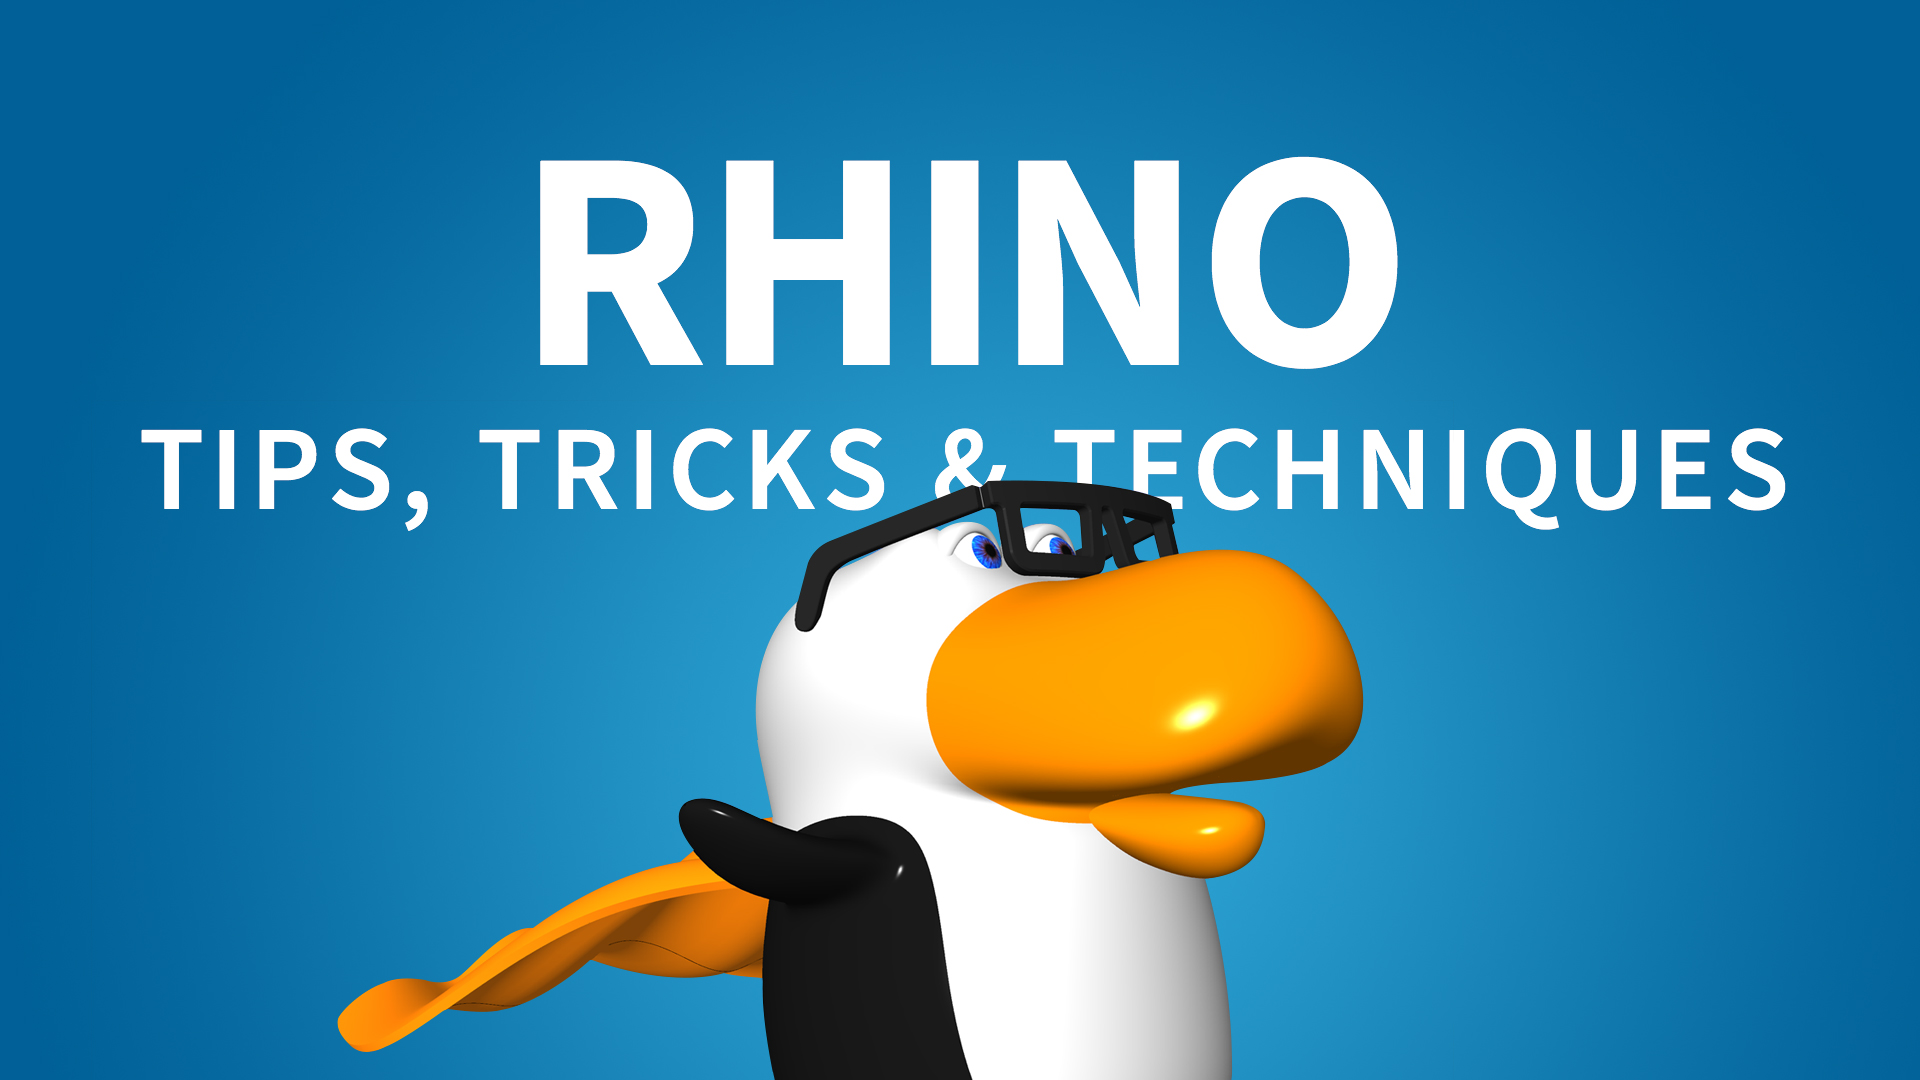 Rhino: Tips, Tricks & Techniques